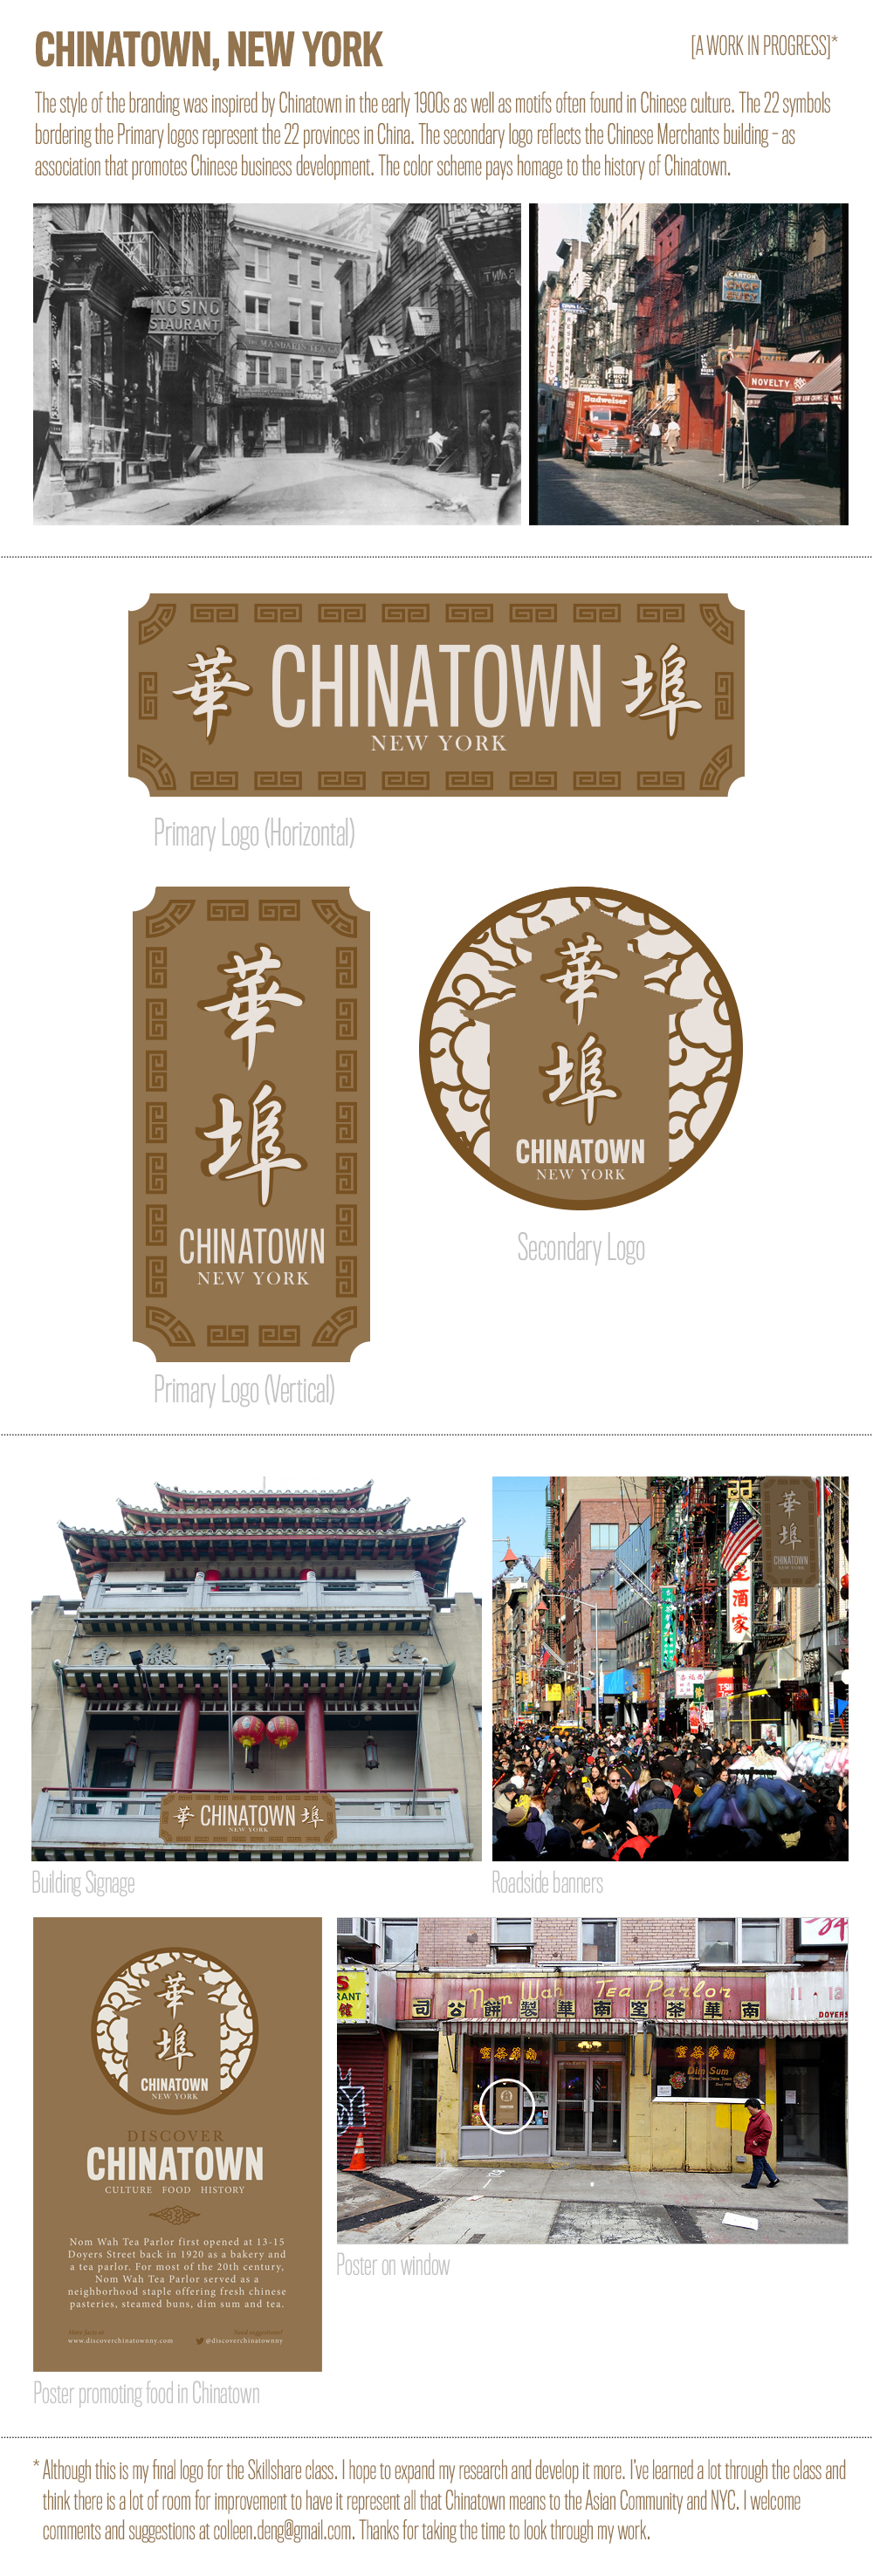 chinatown-explains.jpg